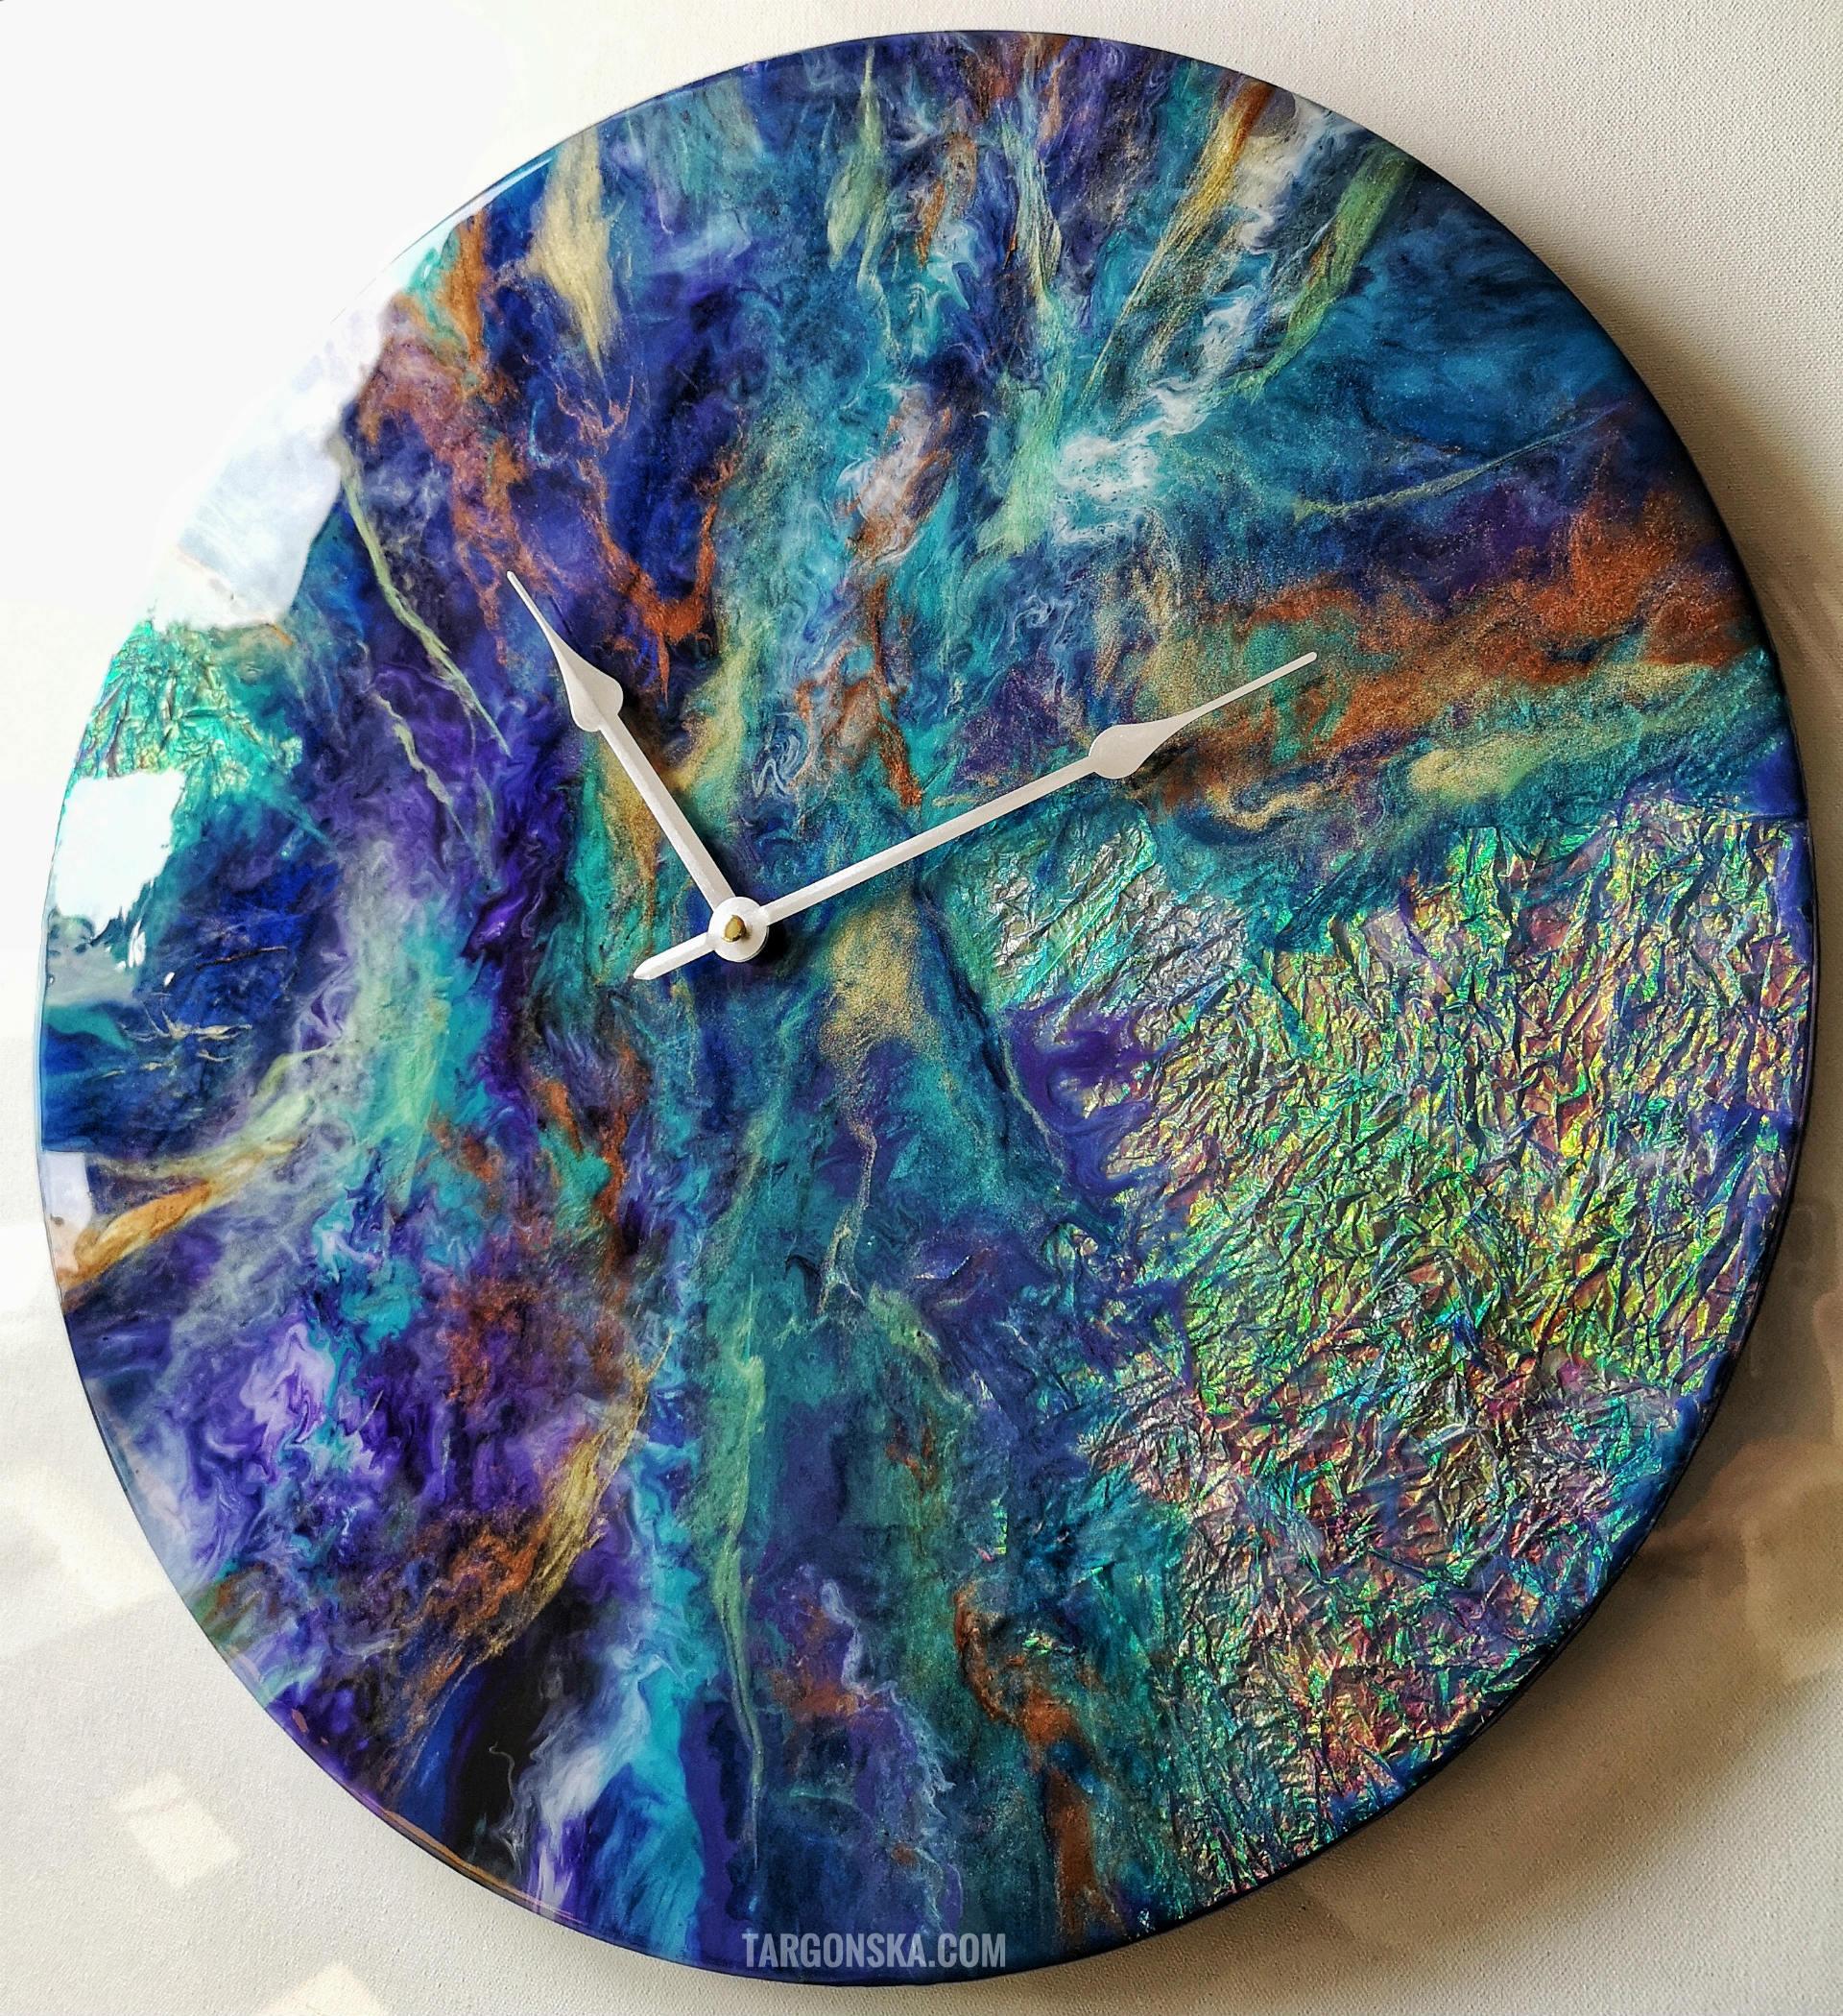 Resin art Clock no 5 Cosmic Clock Targonska on the wall